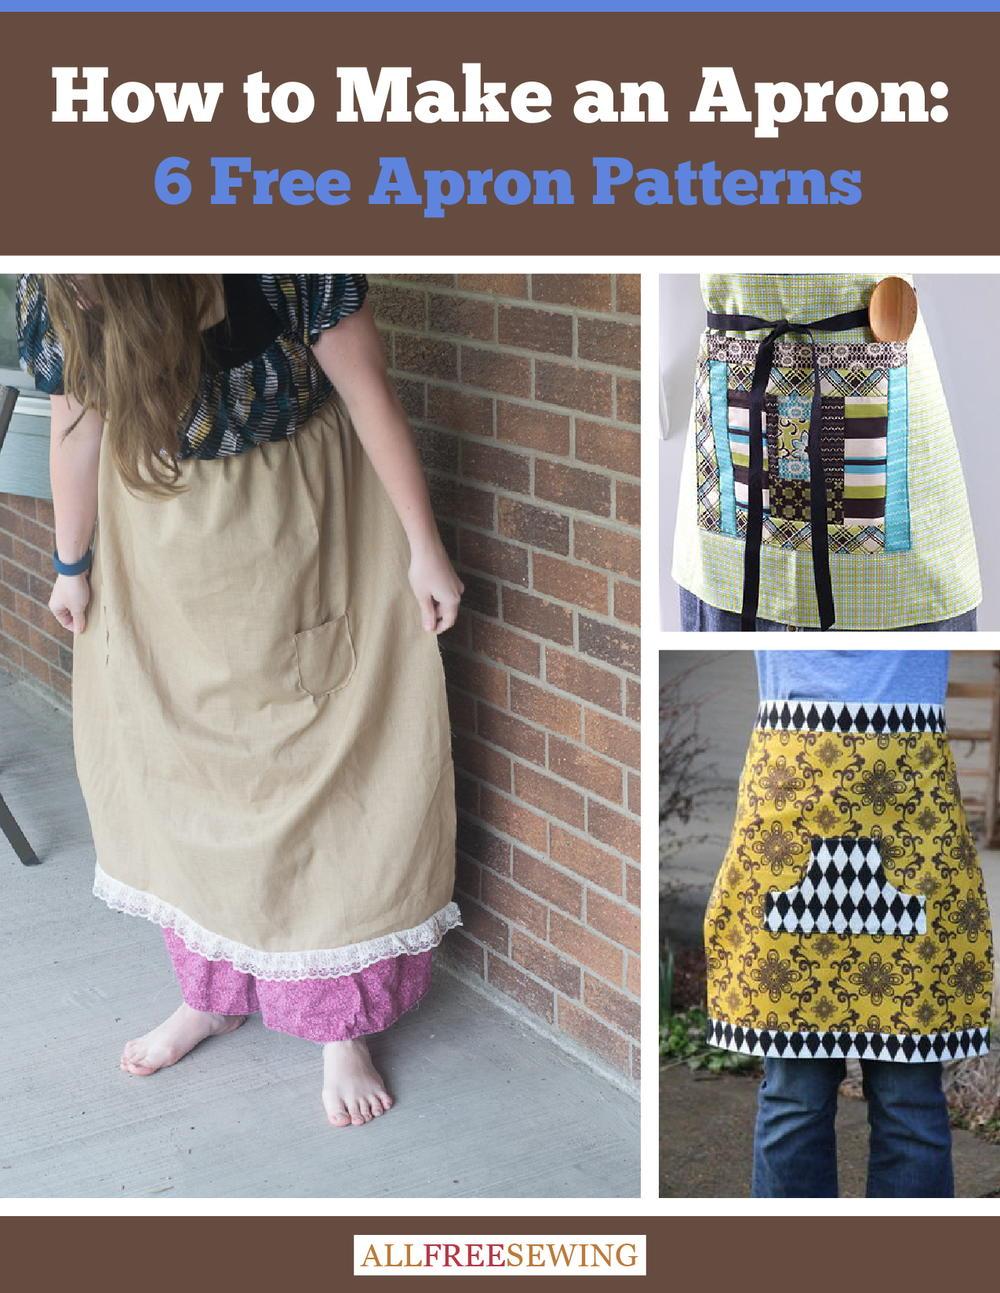 How To Make An Apron 6 Free Apron Patterns